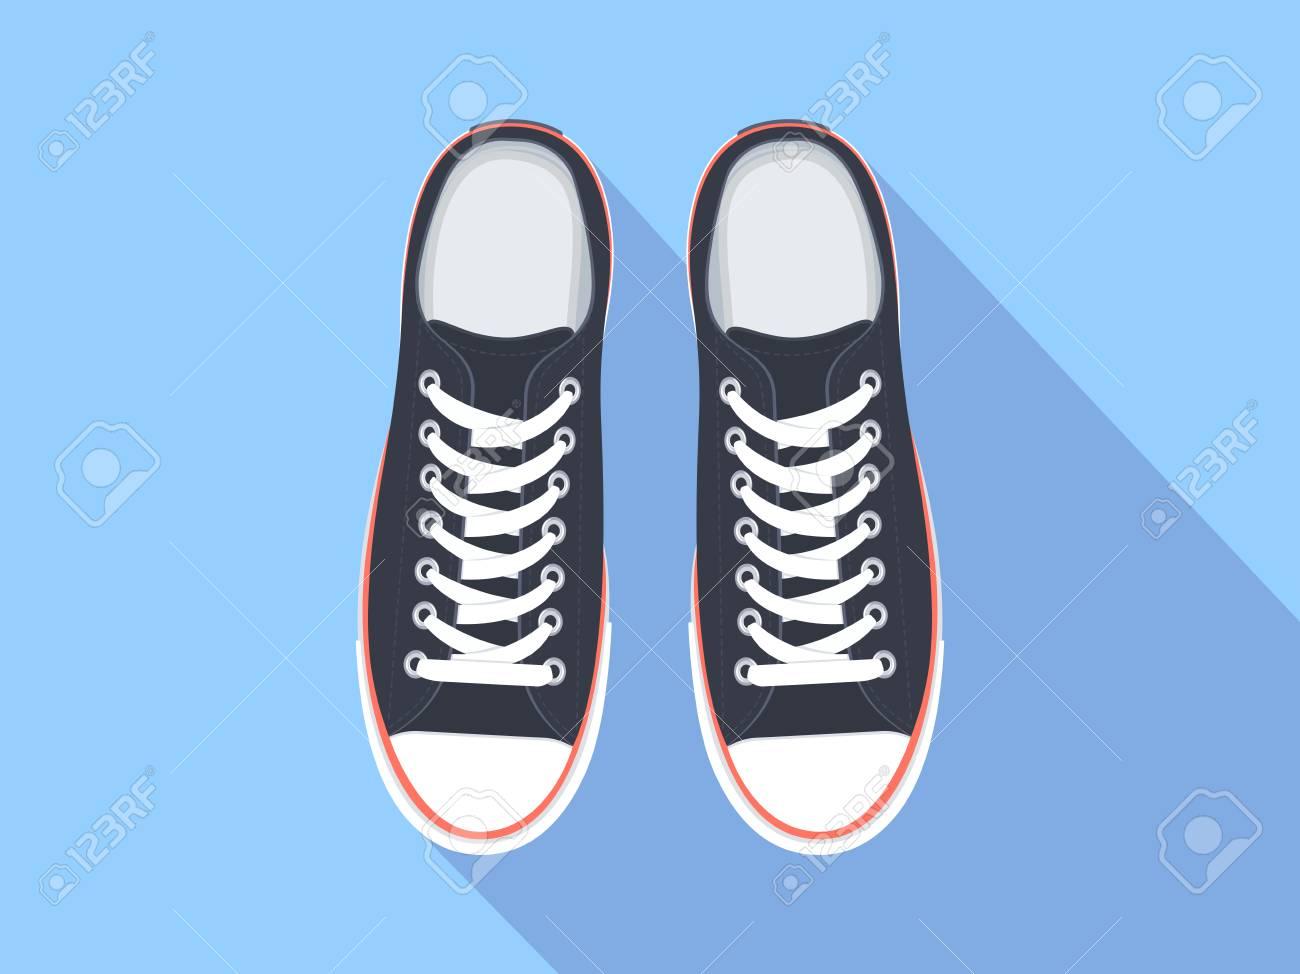 new concept 4594f db7a3 De Sport Chaussures Vue Plat Illustration Dessus Vector Sneakers wS1q5